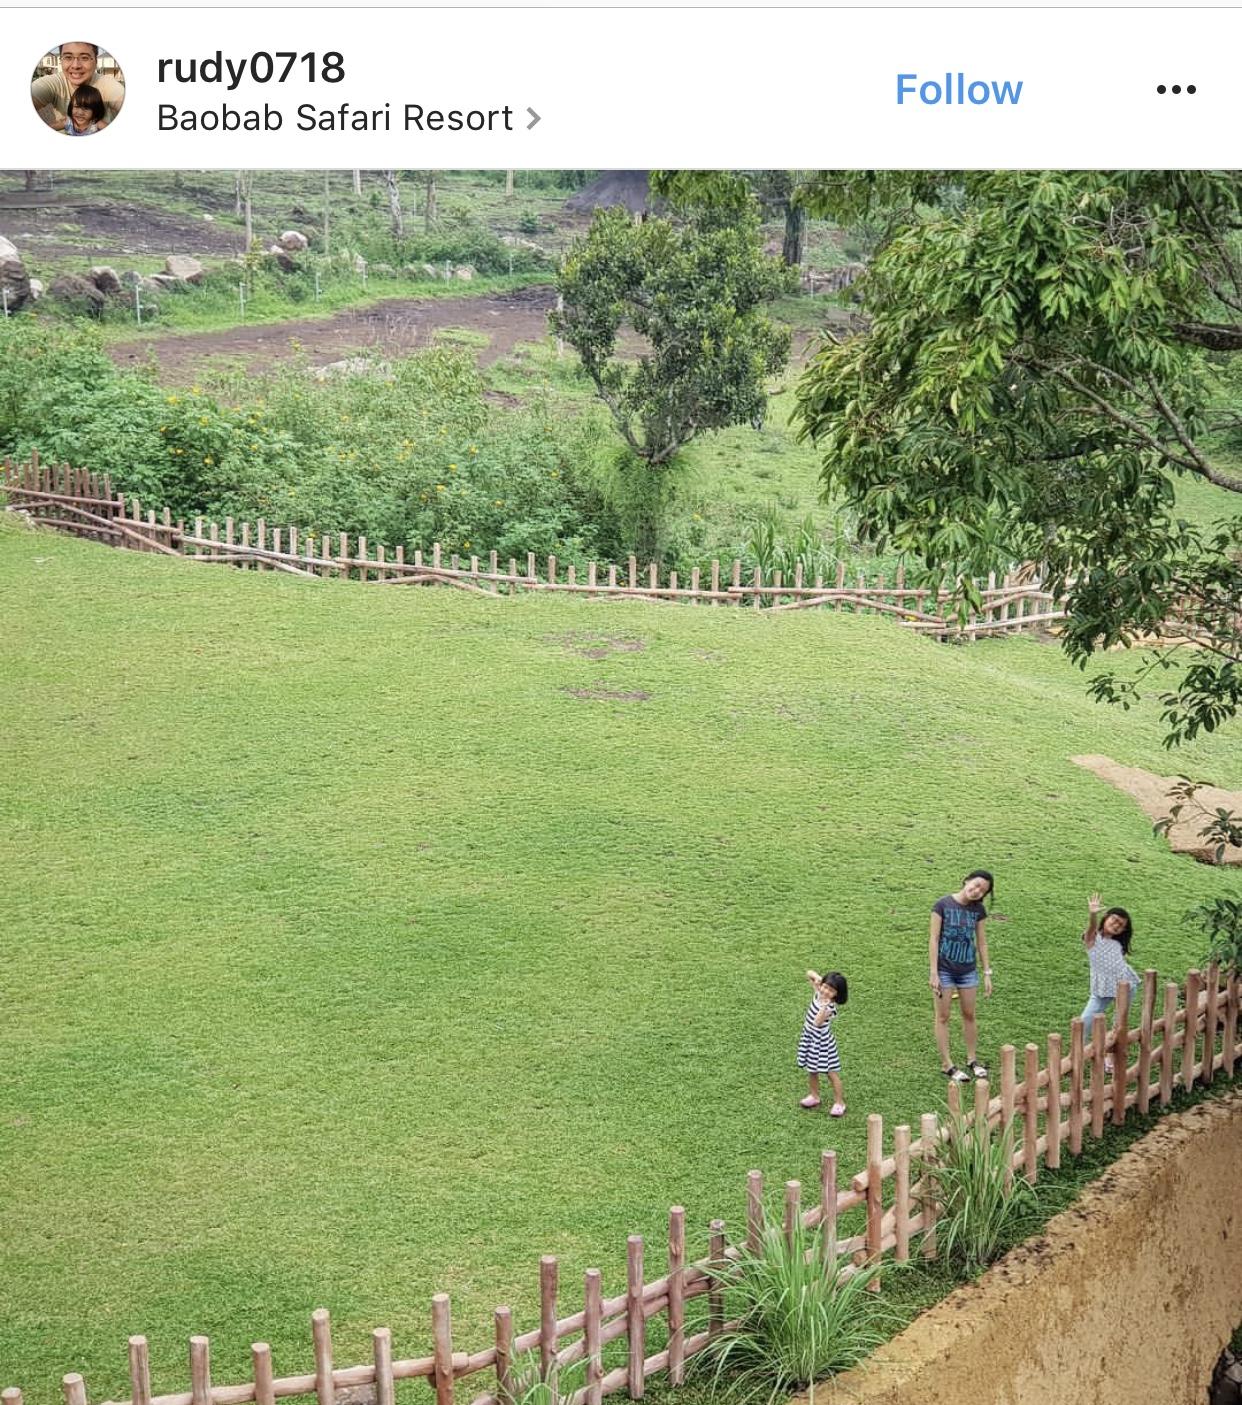 Baobab Safari Prigen Kids Holiday Spots Liburan Anak Informasi Voucher Hotel Liburananak Baobabsafariprigen